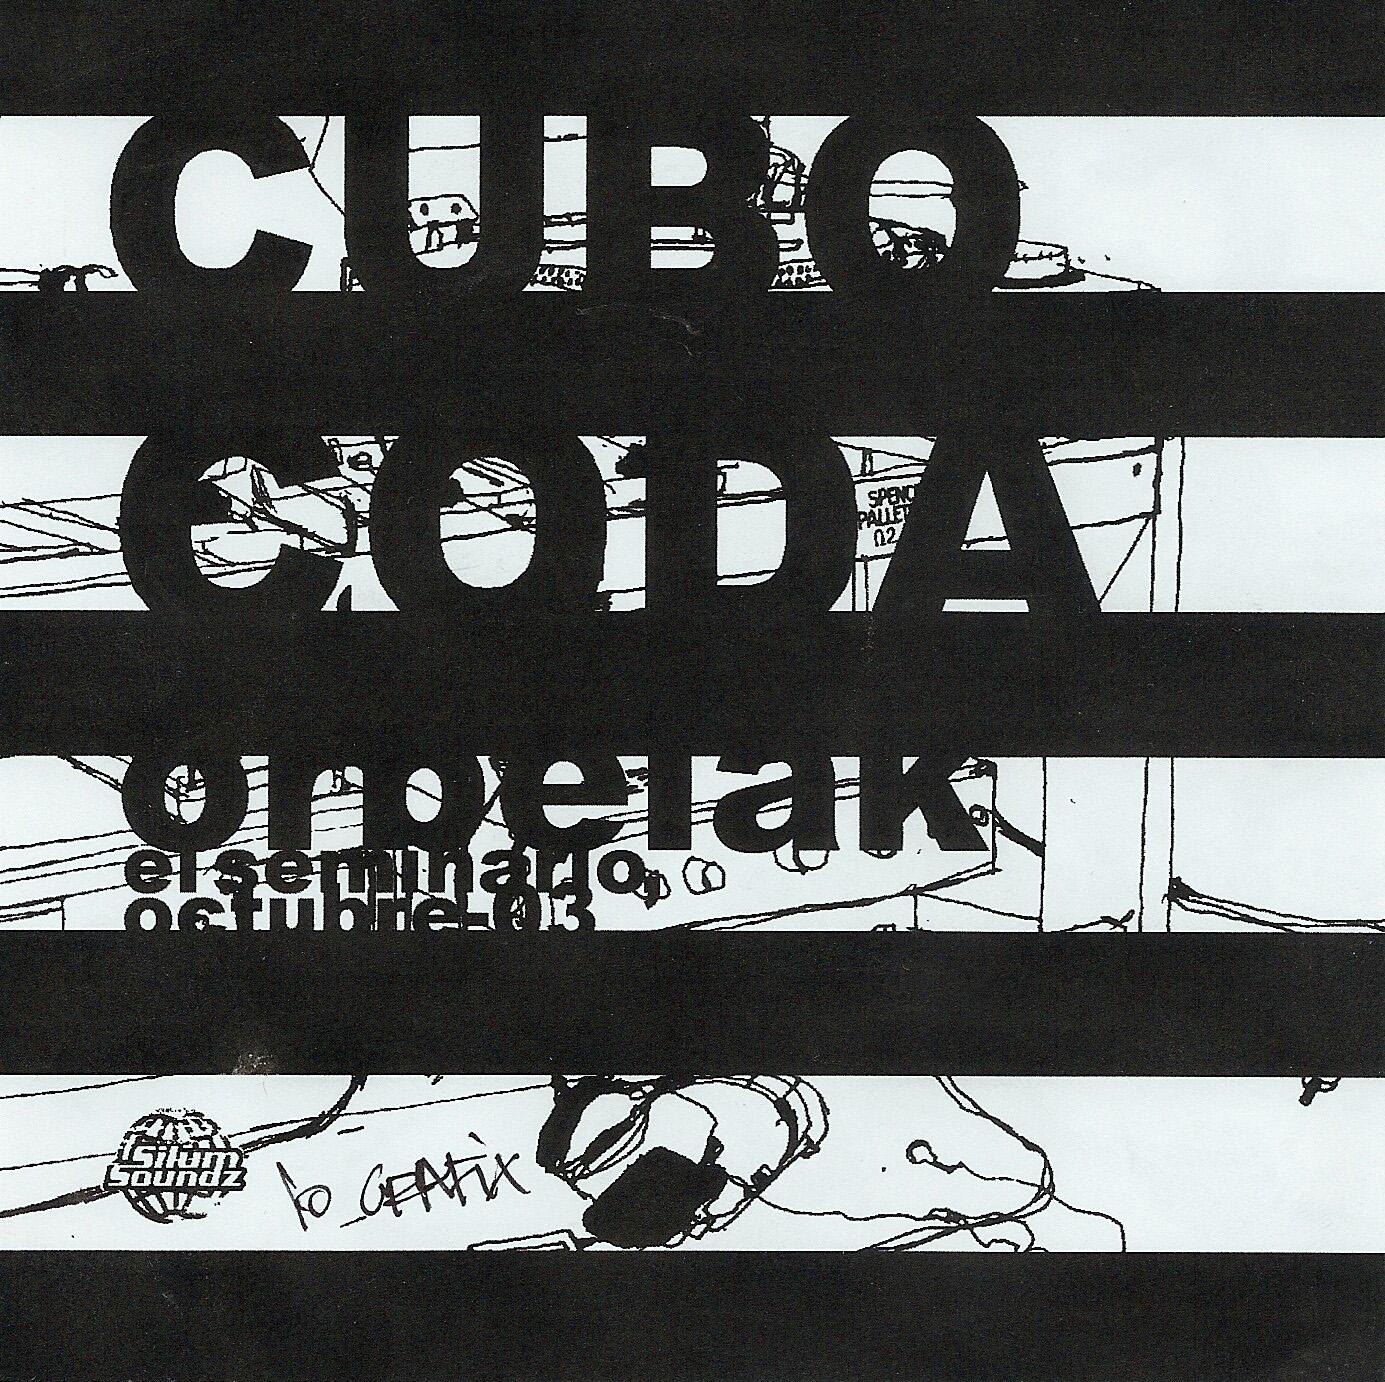 dj cubo, coda, silum soundz